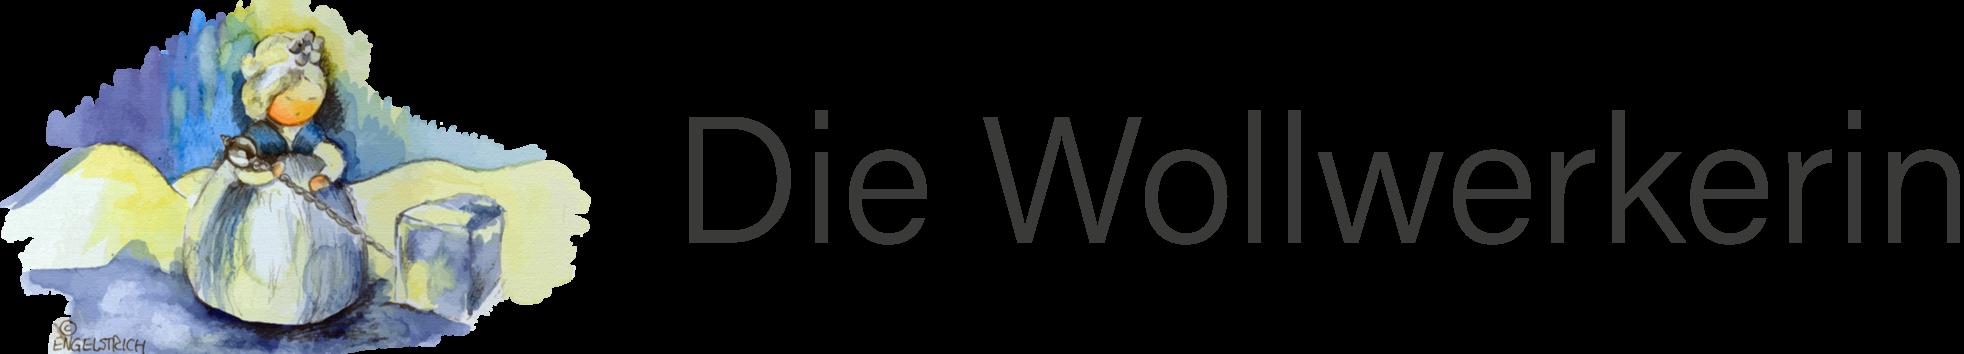 Die Wollwerkerin